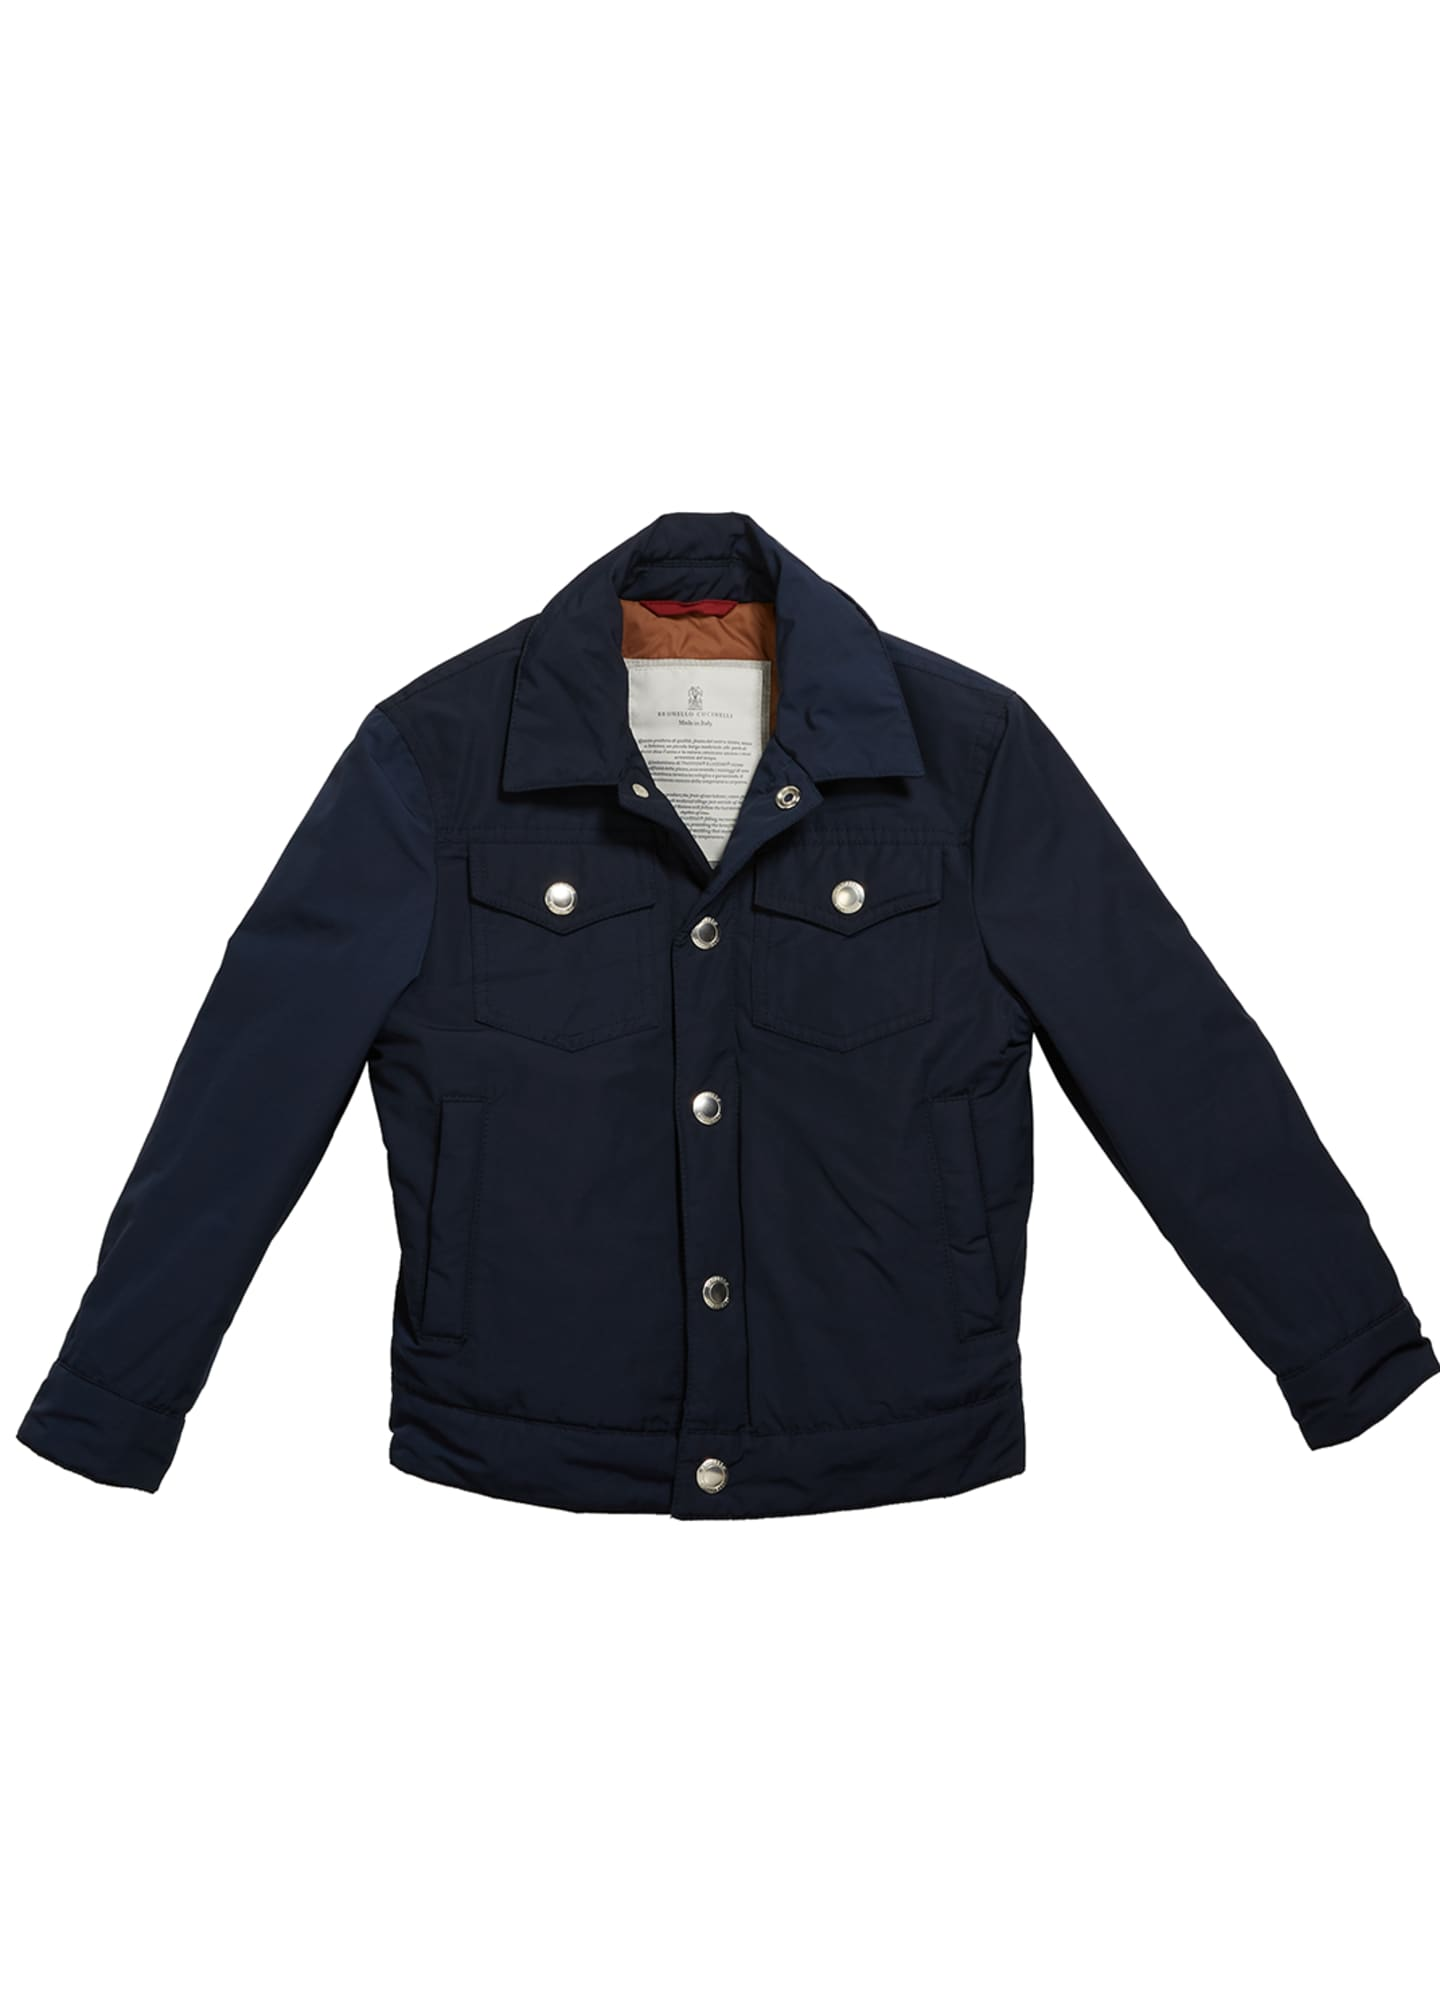 Brunello Cucinelli Boy's Safari Pocket Jacket, Size 8-10